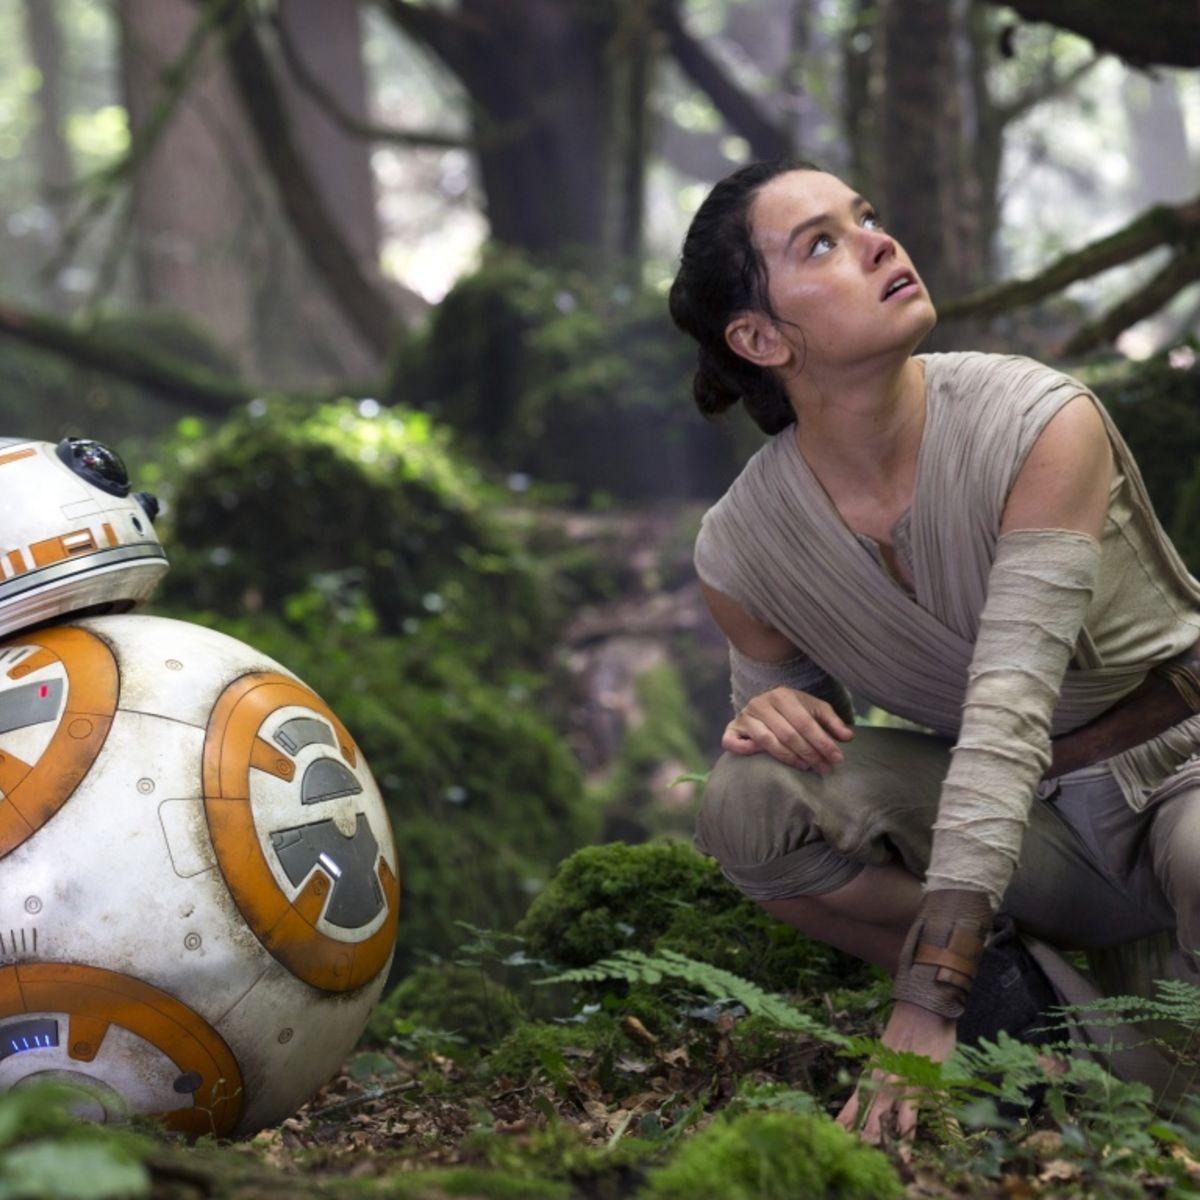 Star-Wars-The-Force-Awakens-R2-D2-Rey-HD-Wallpaper-1366x768.jpg